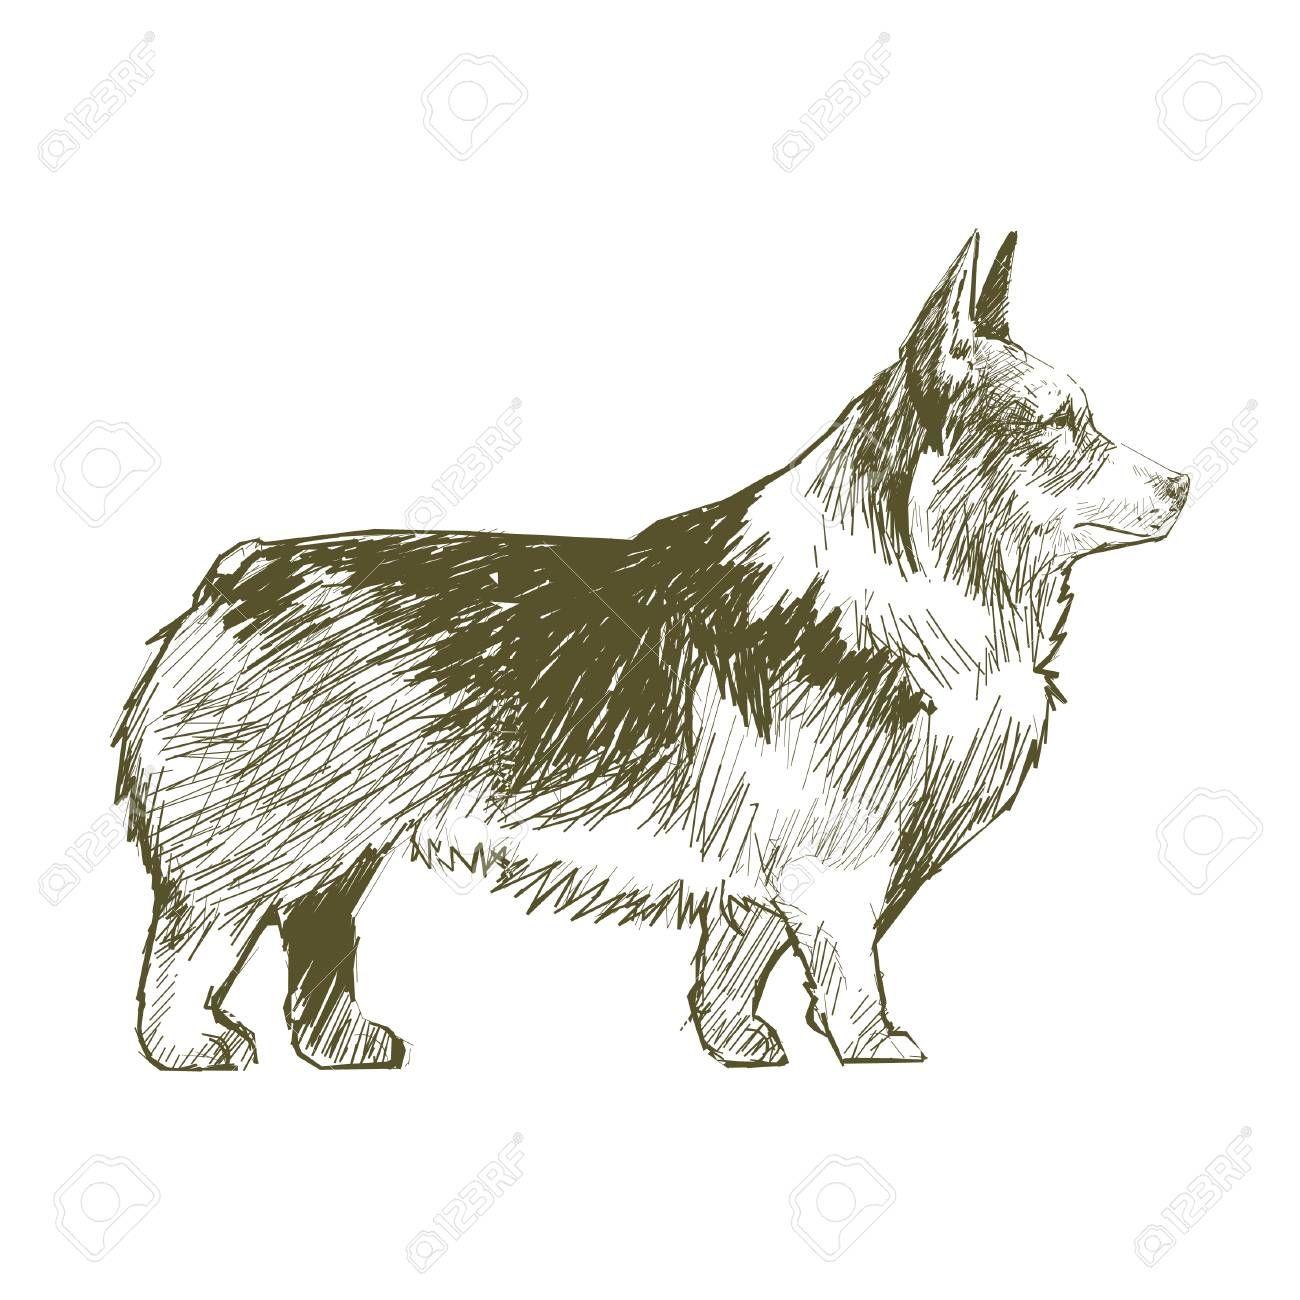 Illustration Drawing Style Of Dog Affiliate Drawing Illustration Dog Style Print Drawings Illustration